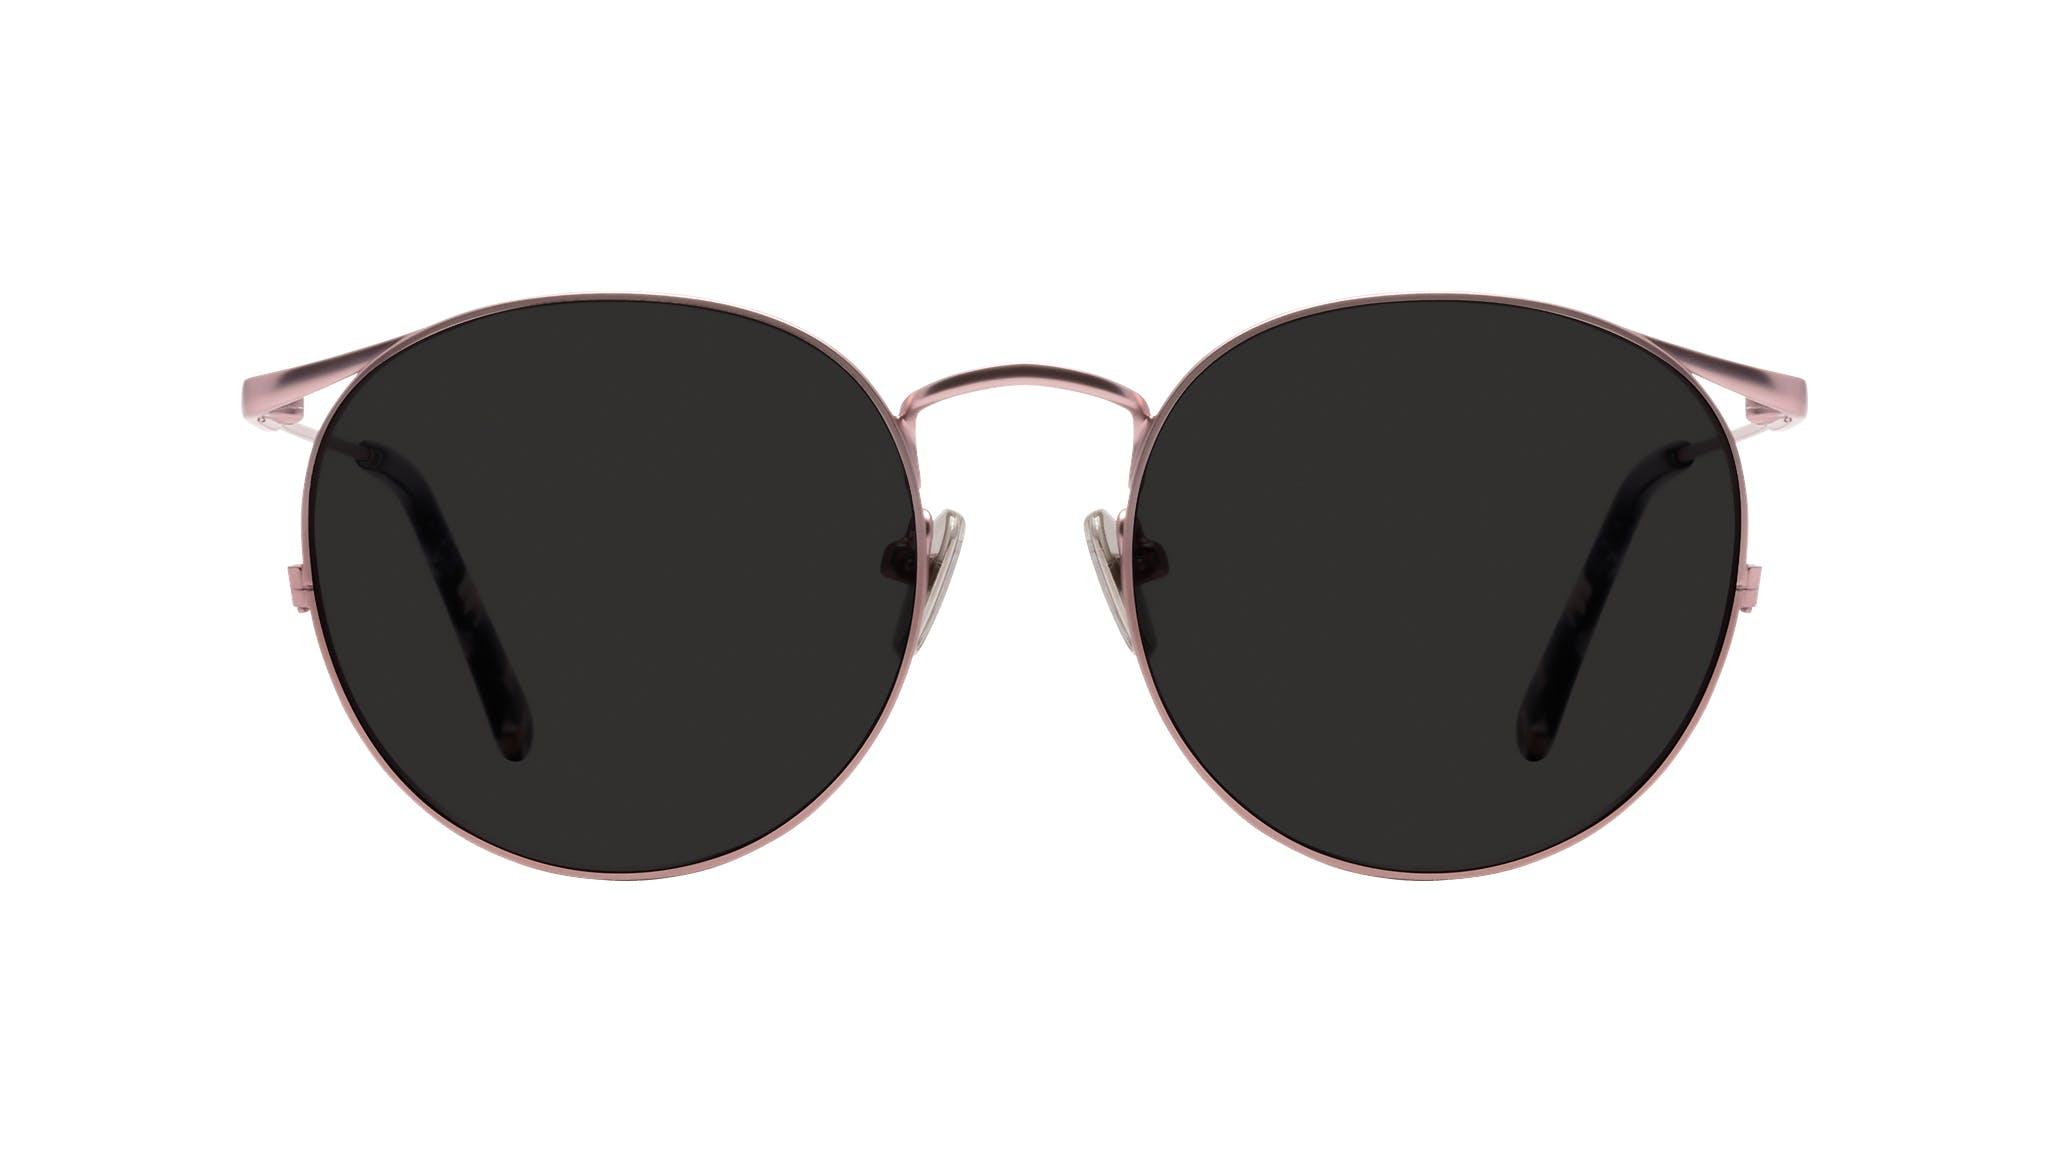 Affordable Fashion Glasses Round Sunglasses Women Curve Blush